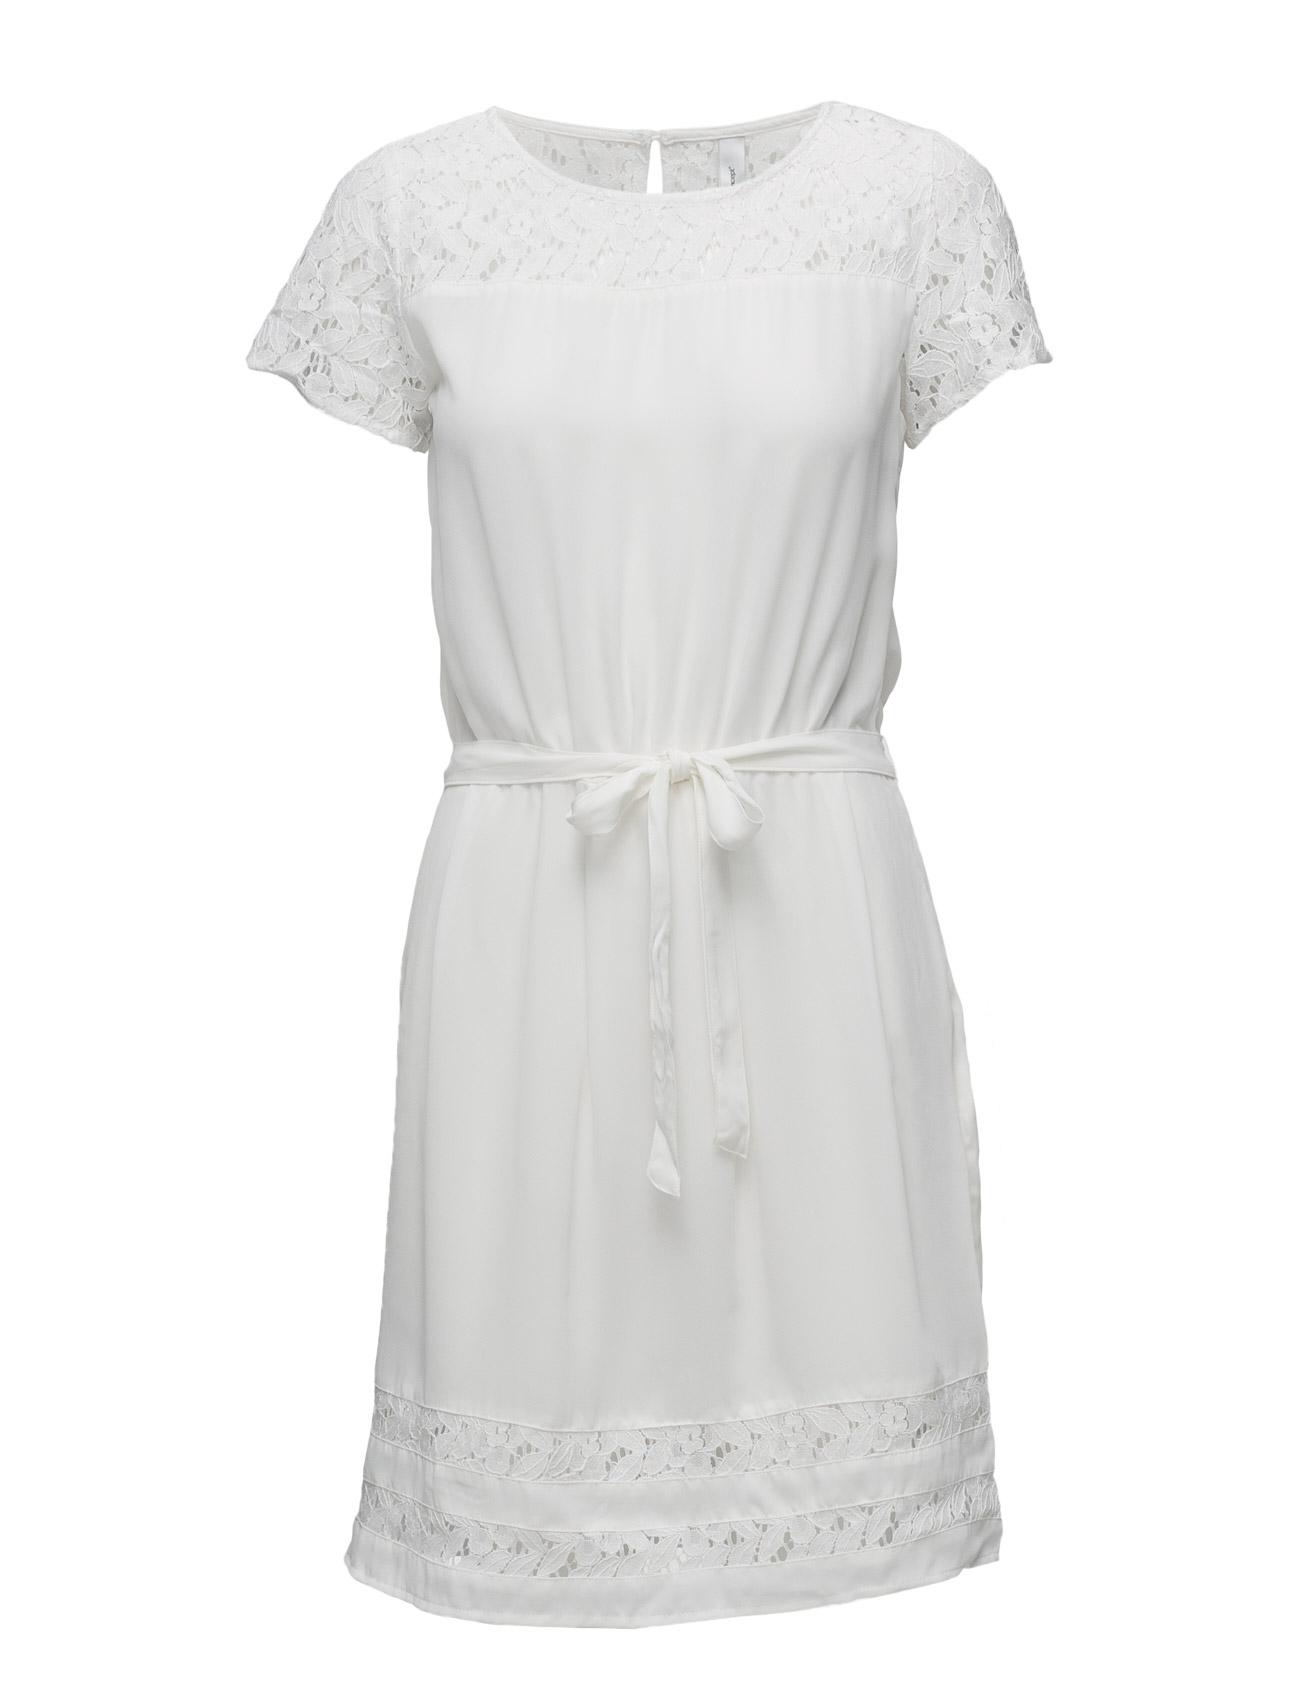 Cemre Soyaconcept Korte kjoler til Damer i Råhvid